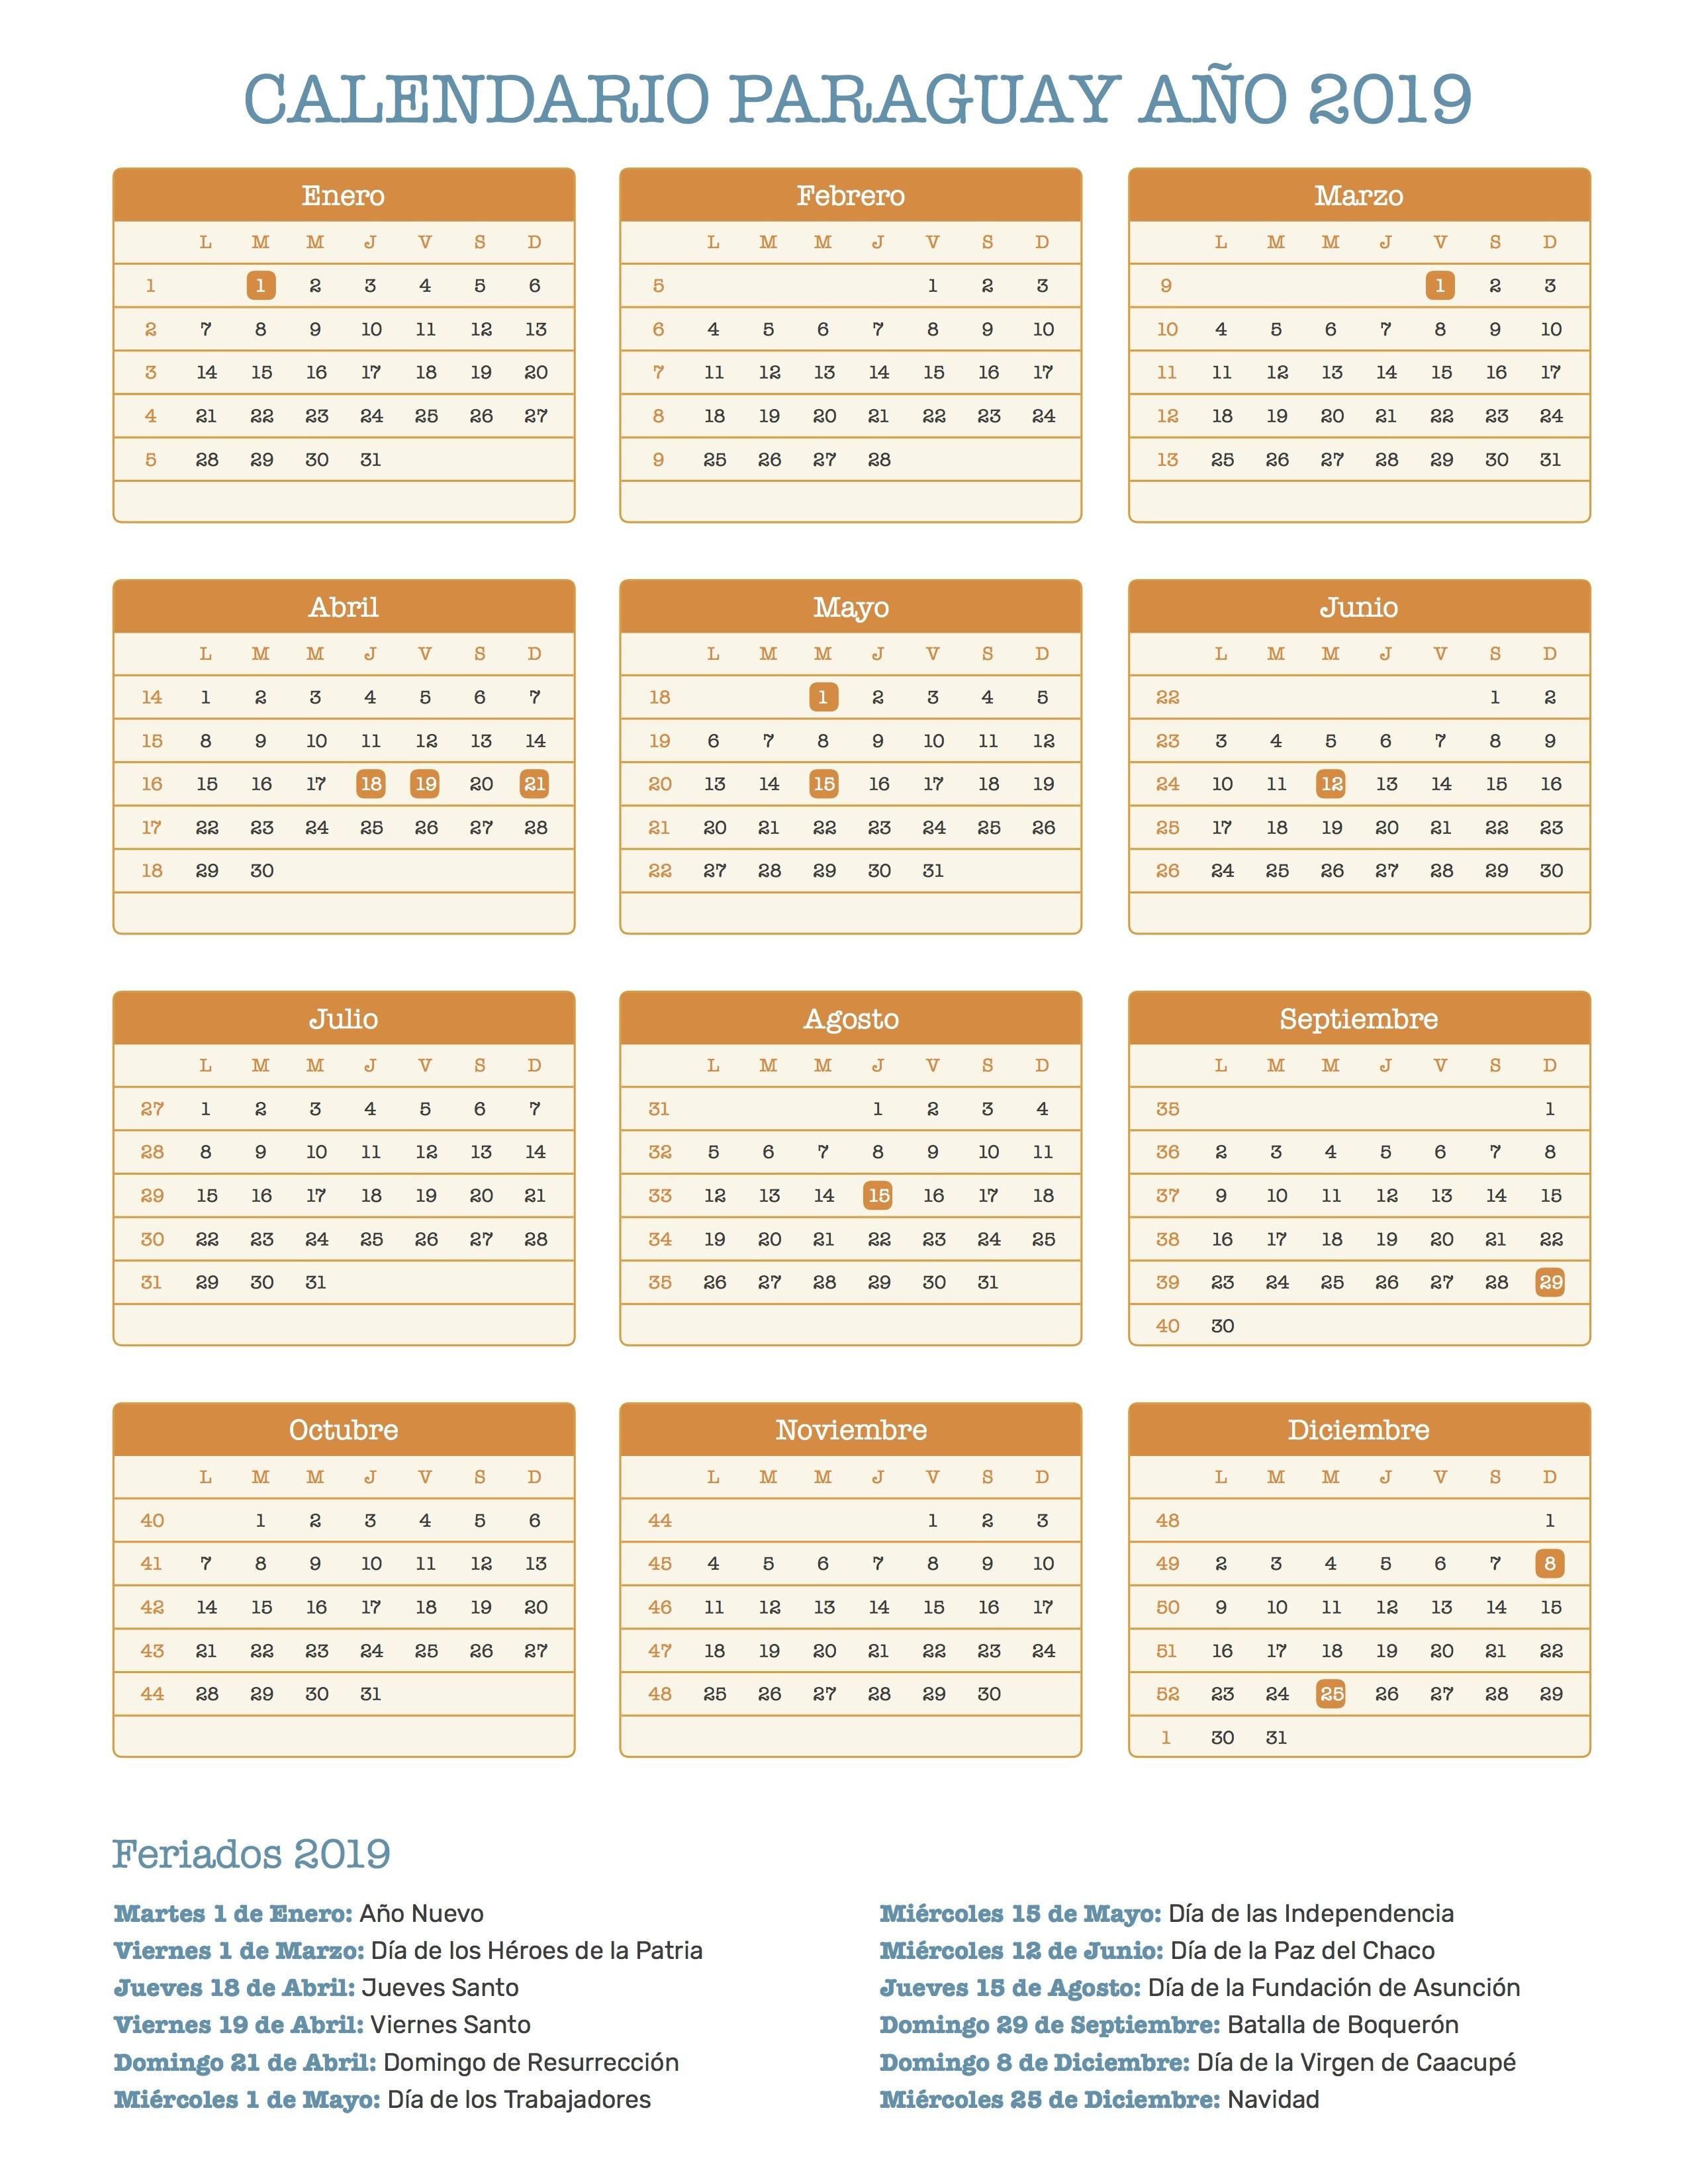 Index of print calendario retro 2550x3300 Mmjv almanaque calendario 2019 costa rica